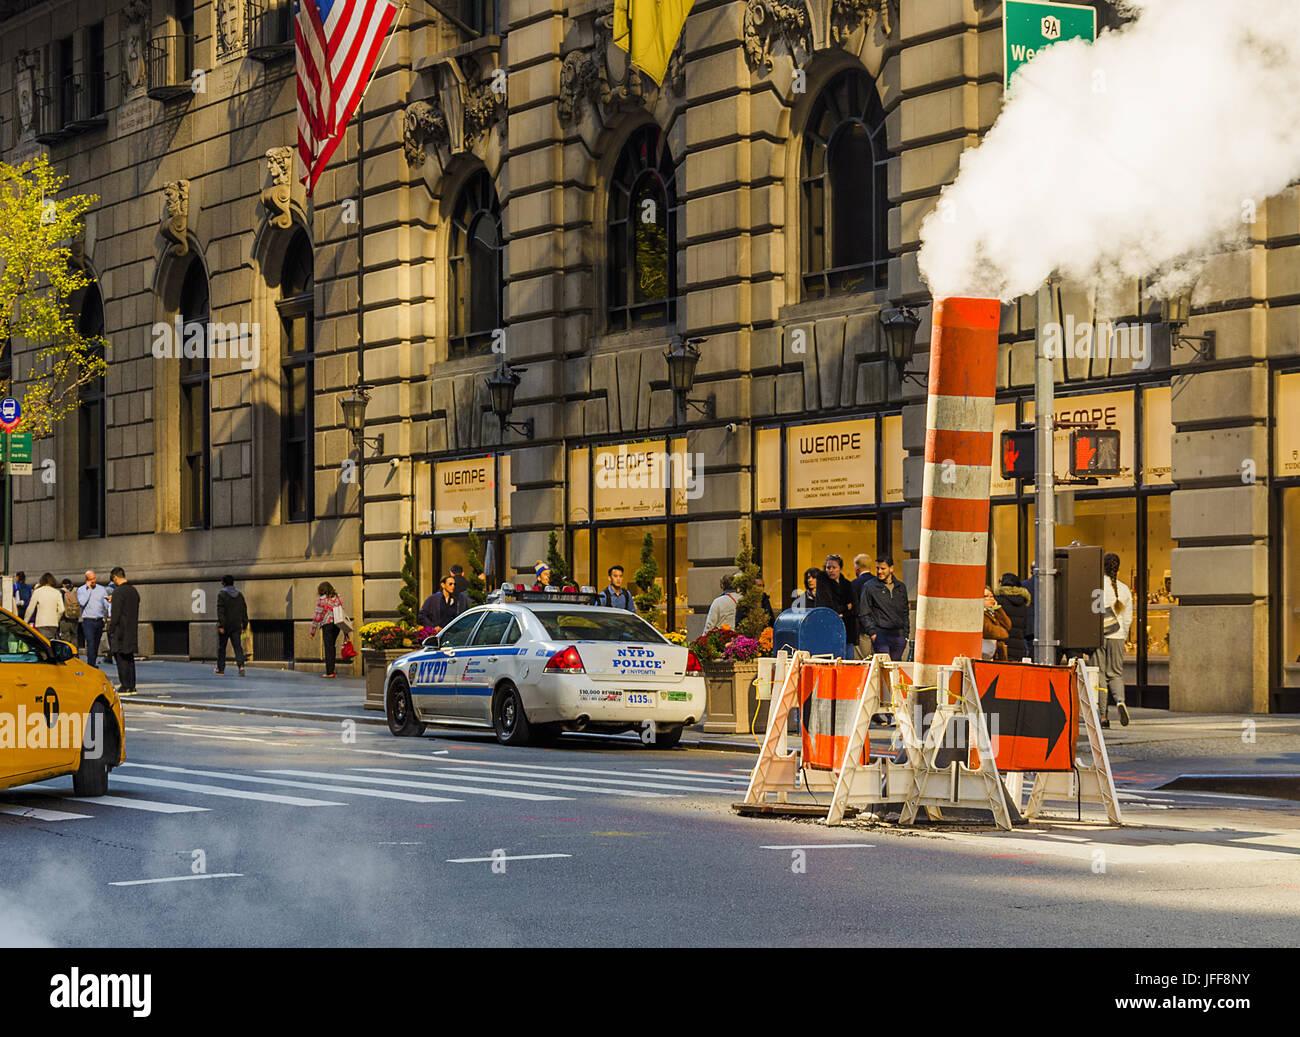 New York Steam - Stock Image